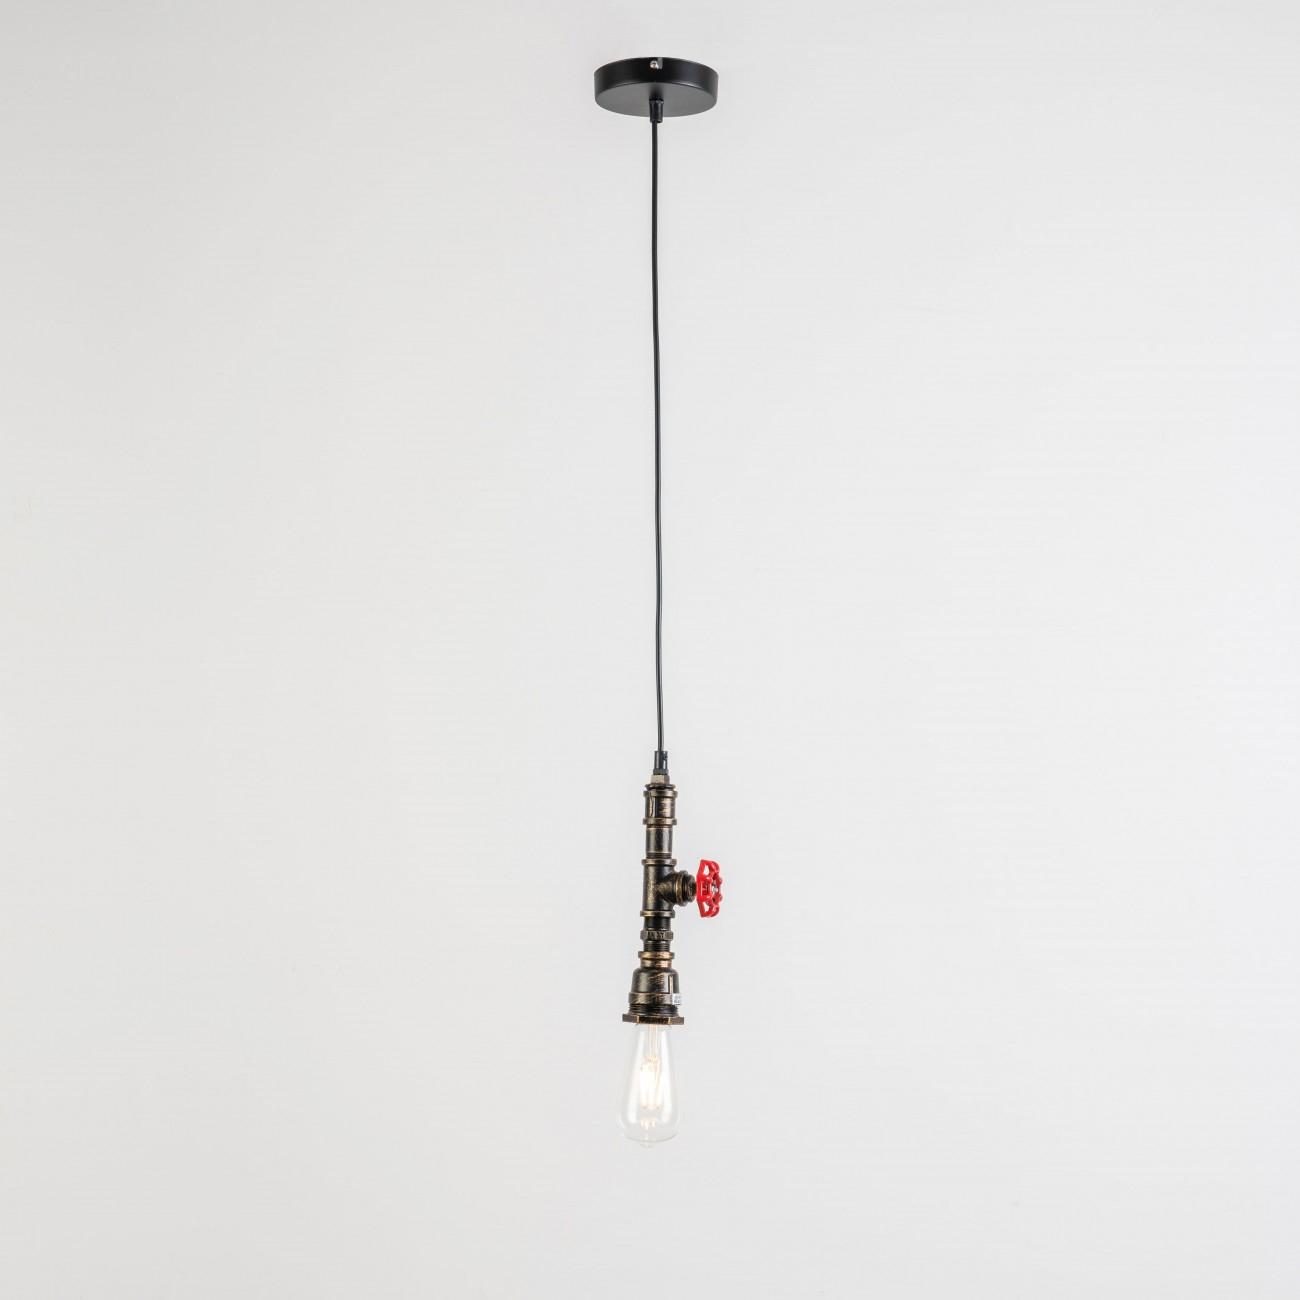 Éclairage style campagne rustique  lampe tuyau